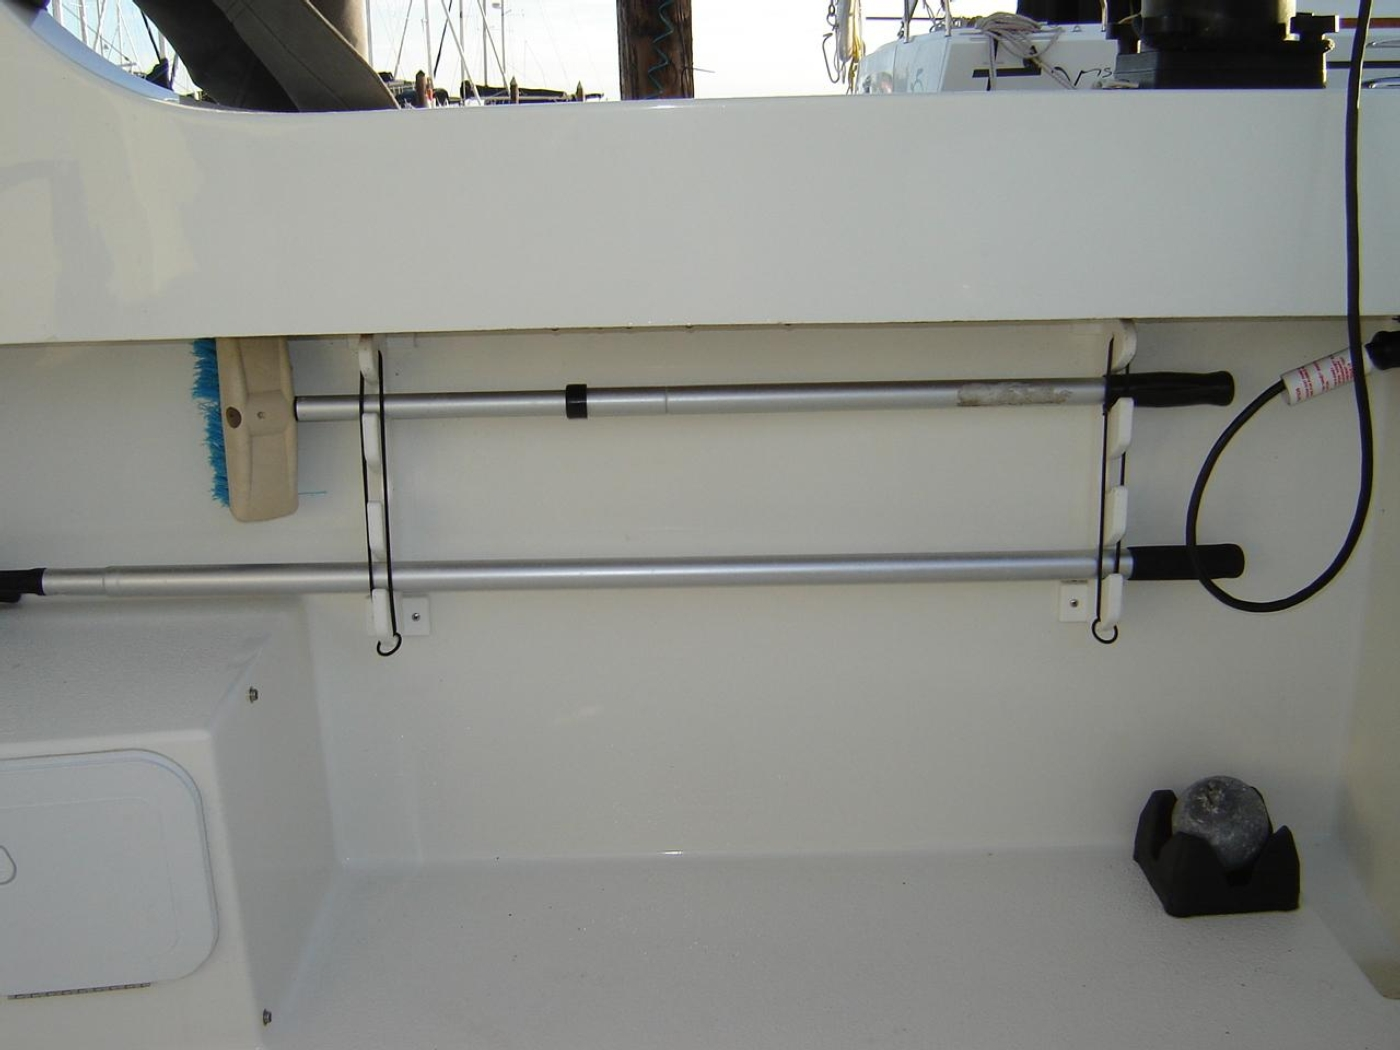 2019 Monaro 235 Sport, Rod Storage in Cockpit